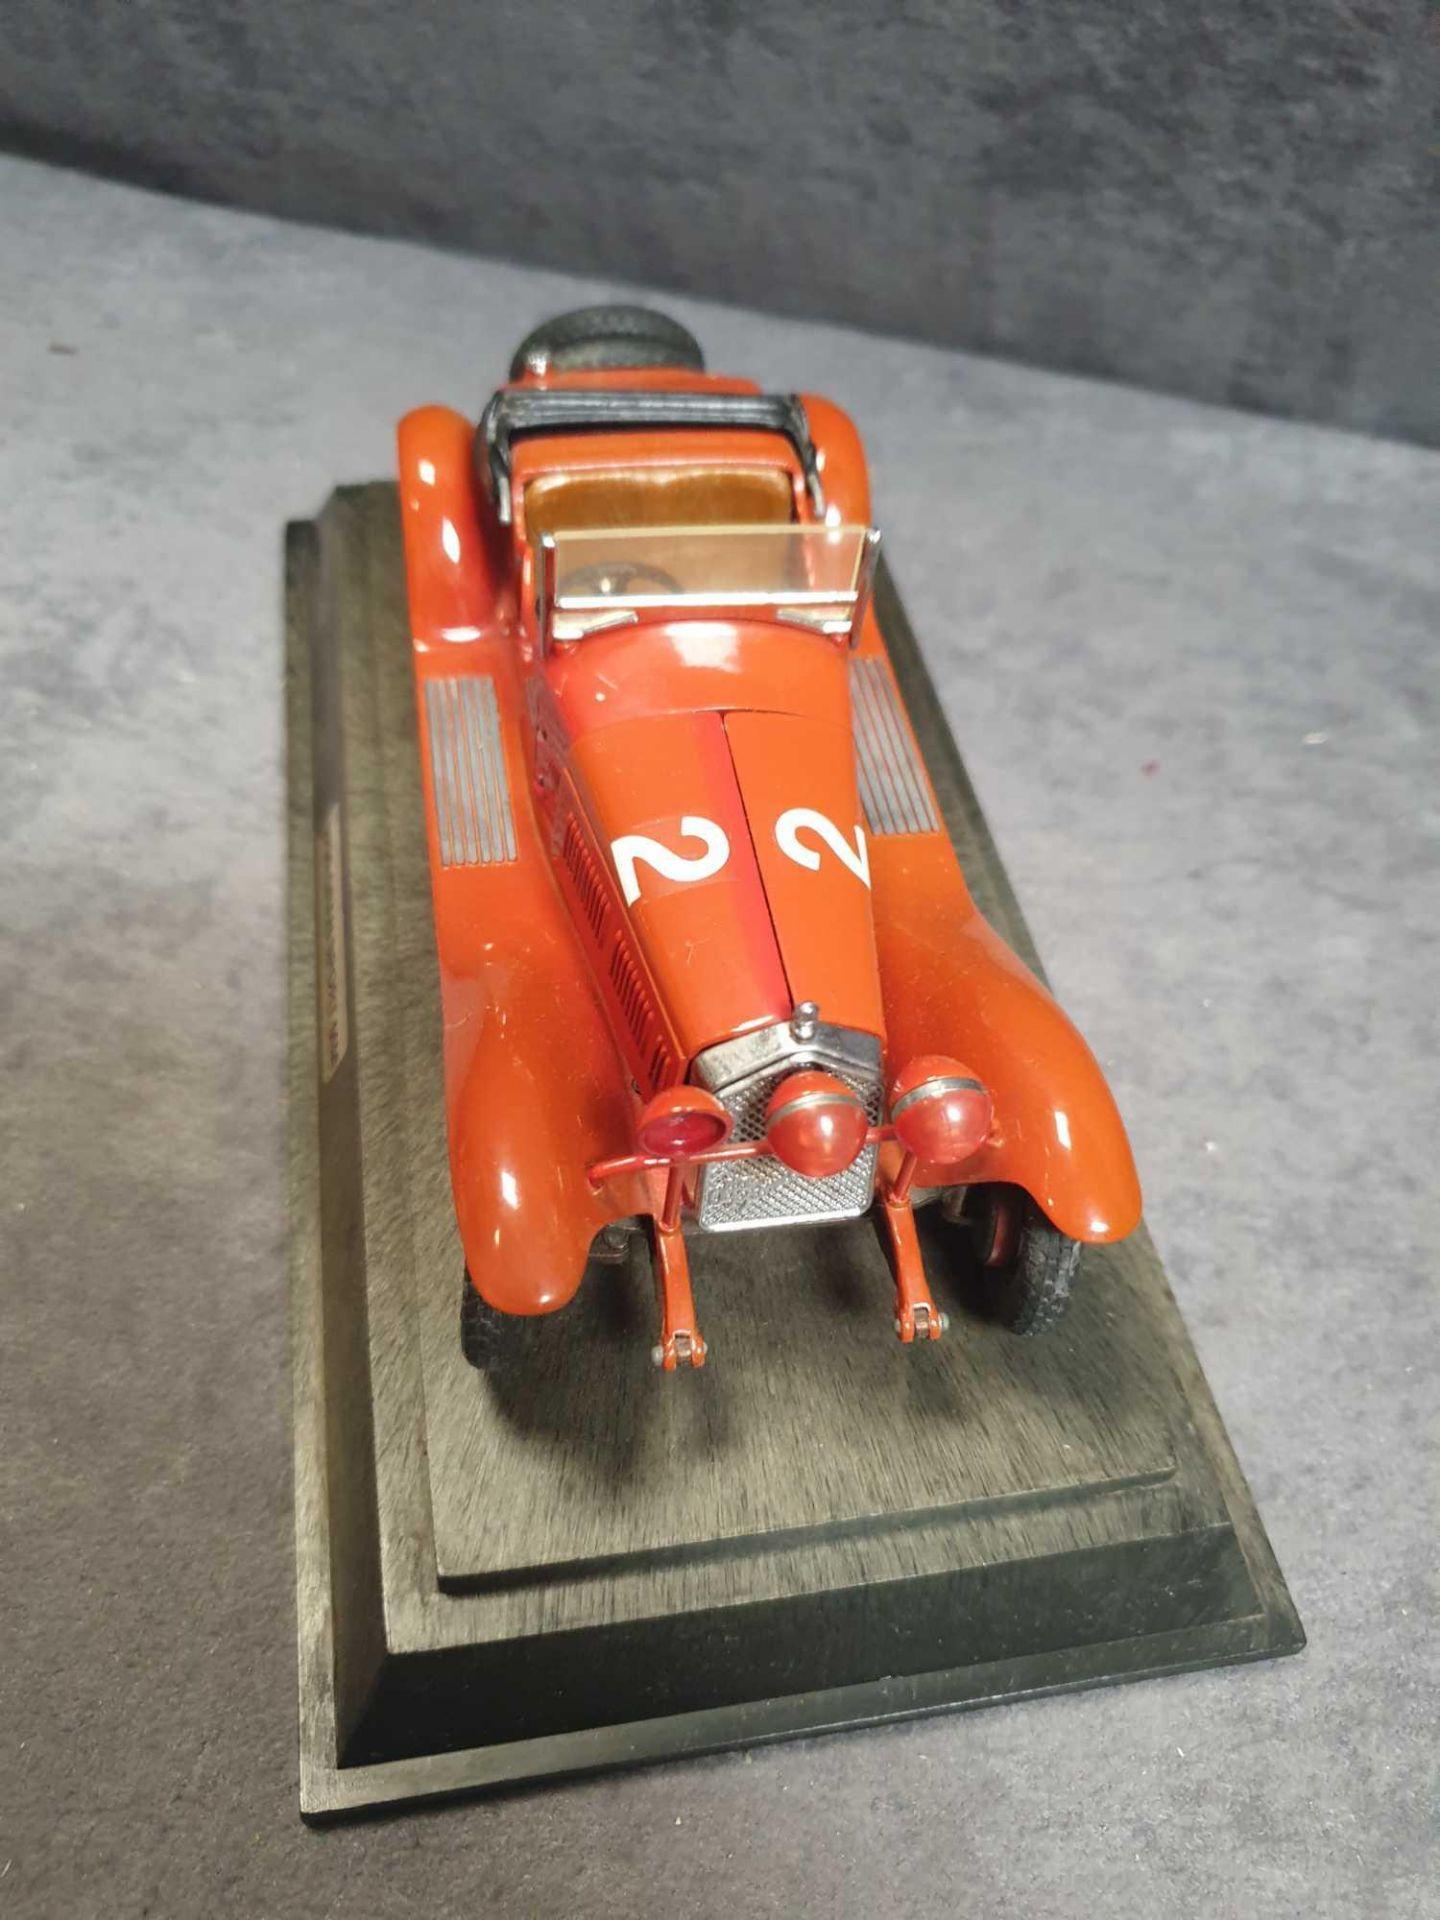 Lotto 1273 - Togi Ialpha Romeo 1750cc Zagato Millie On Wood Plinth In The Mid-1920s, Alfa's RL Was Considered Too